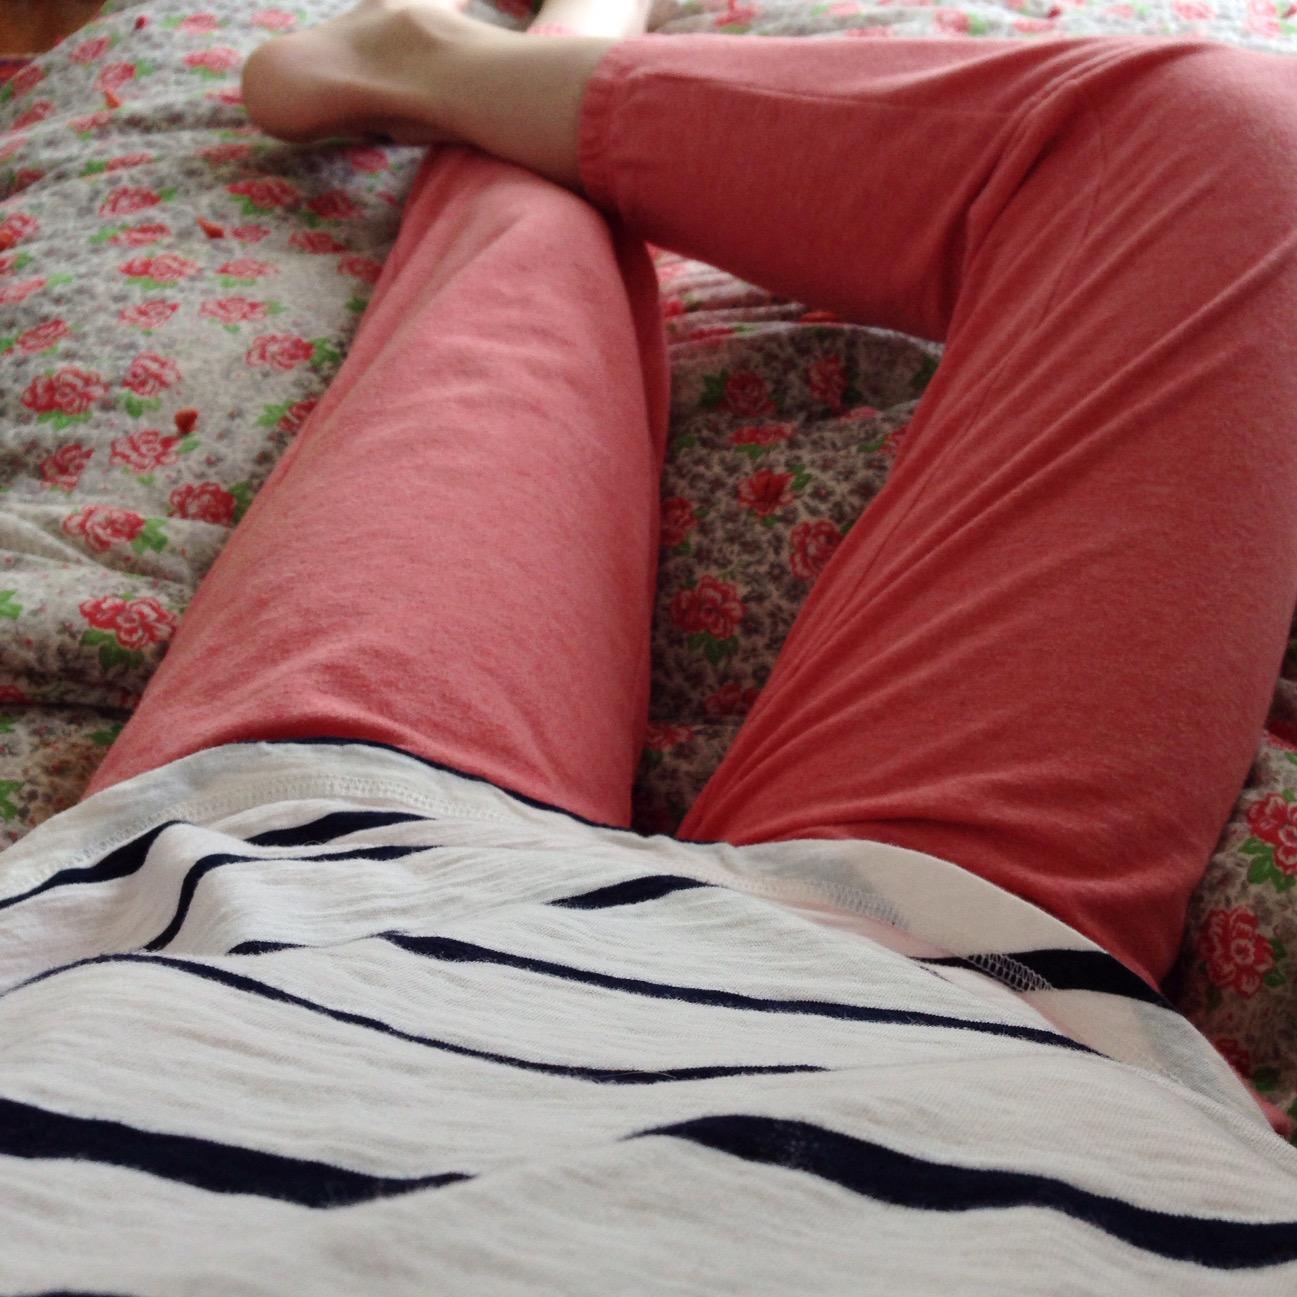 comfy in sweatpants